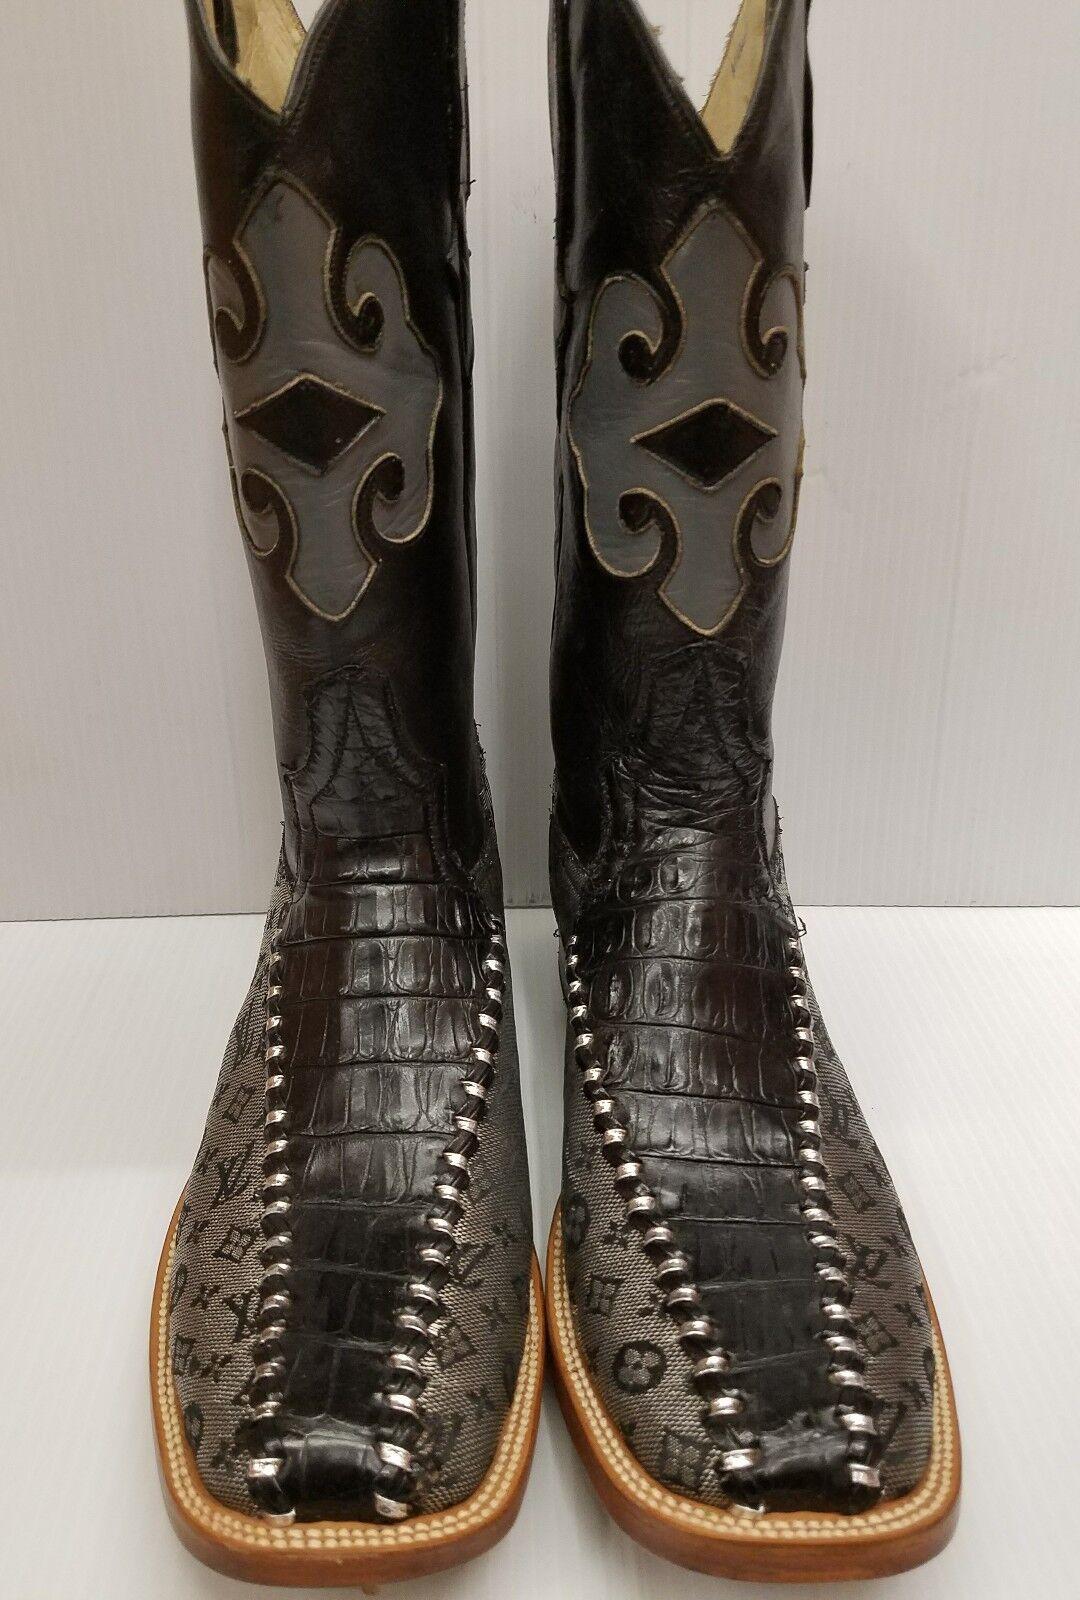 Men's BOOTS & BELT ALLIGATOR BELLY   FASHION LOGO SQUARE TOE BOTAS RODEO